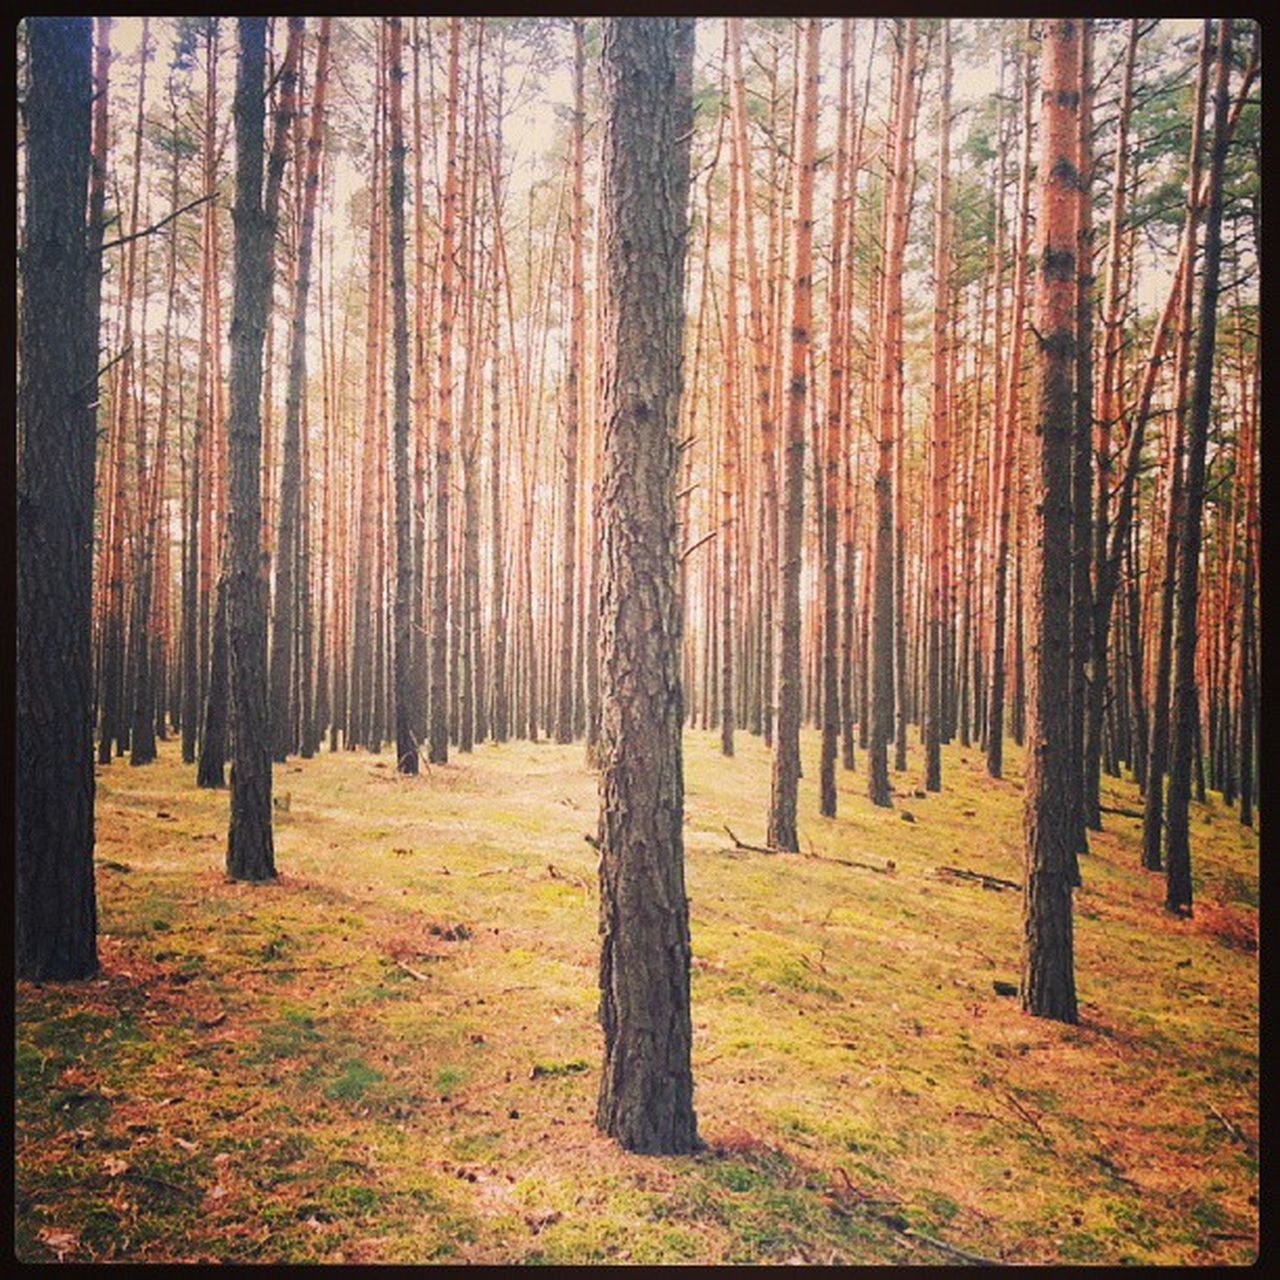 Picking mushrooms. Forrest Trees Pines at Studienka Zahorie Slovensko.